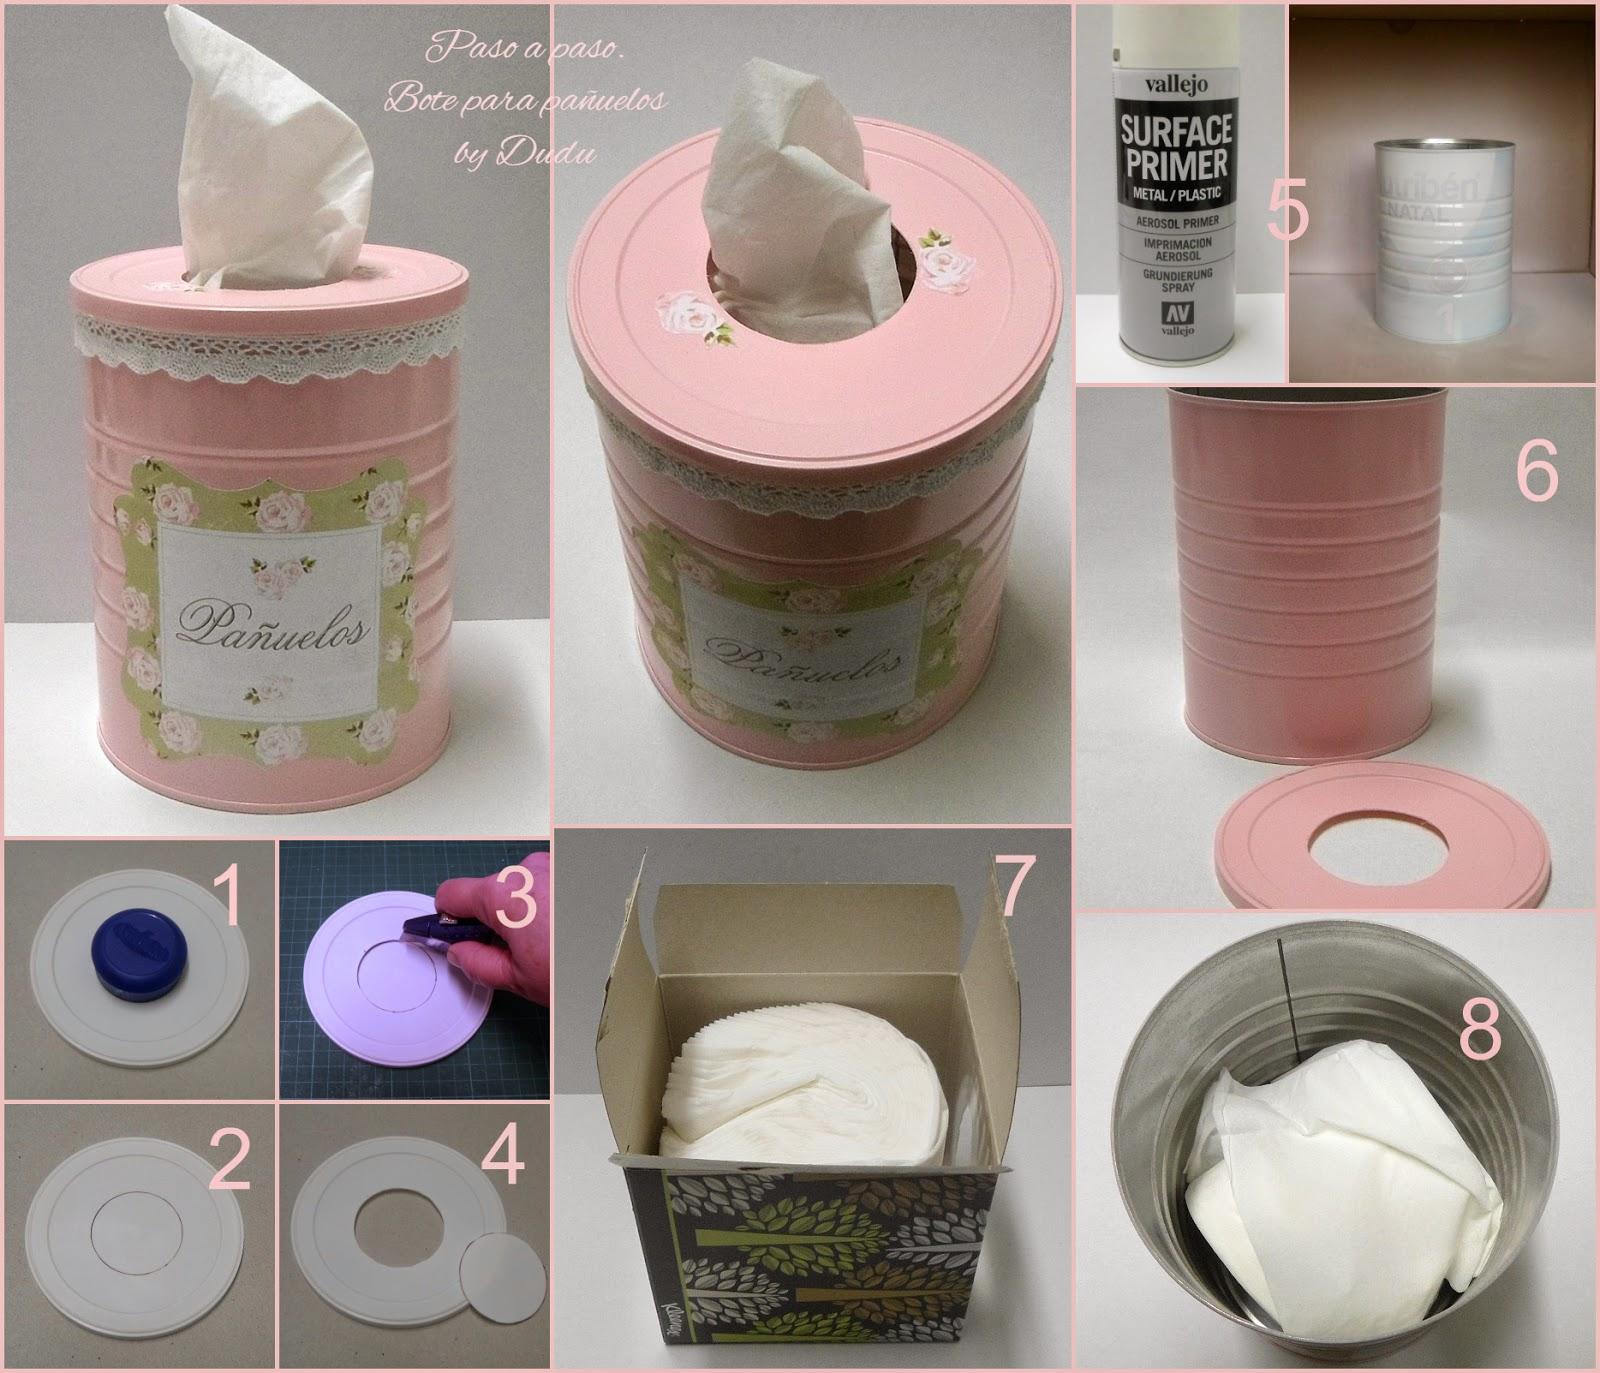 Les cosetes de dudu tutorial bote de leche infantil - Se puede pintar el aluminio ...